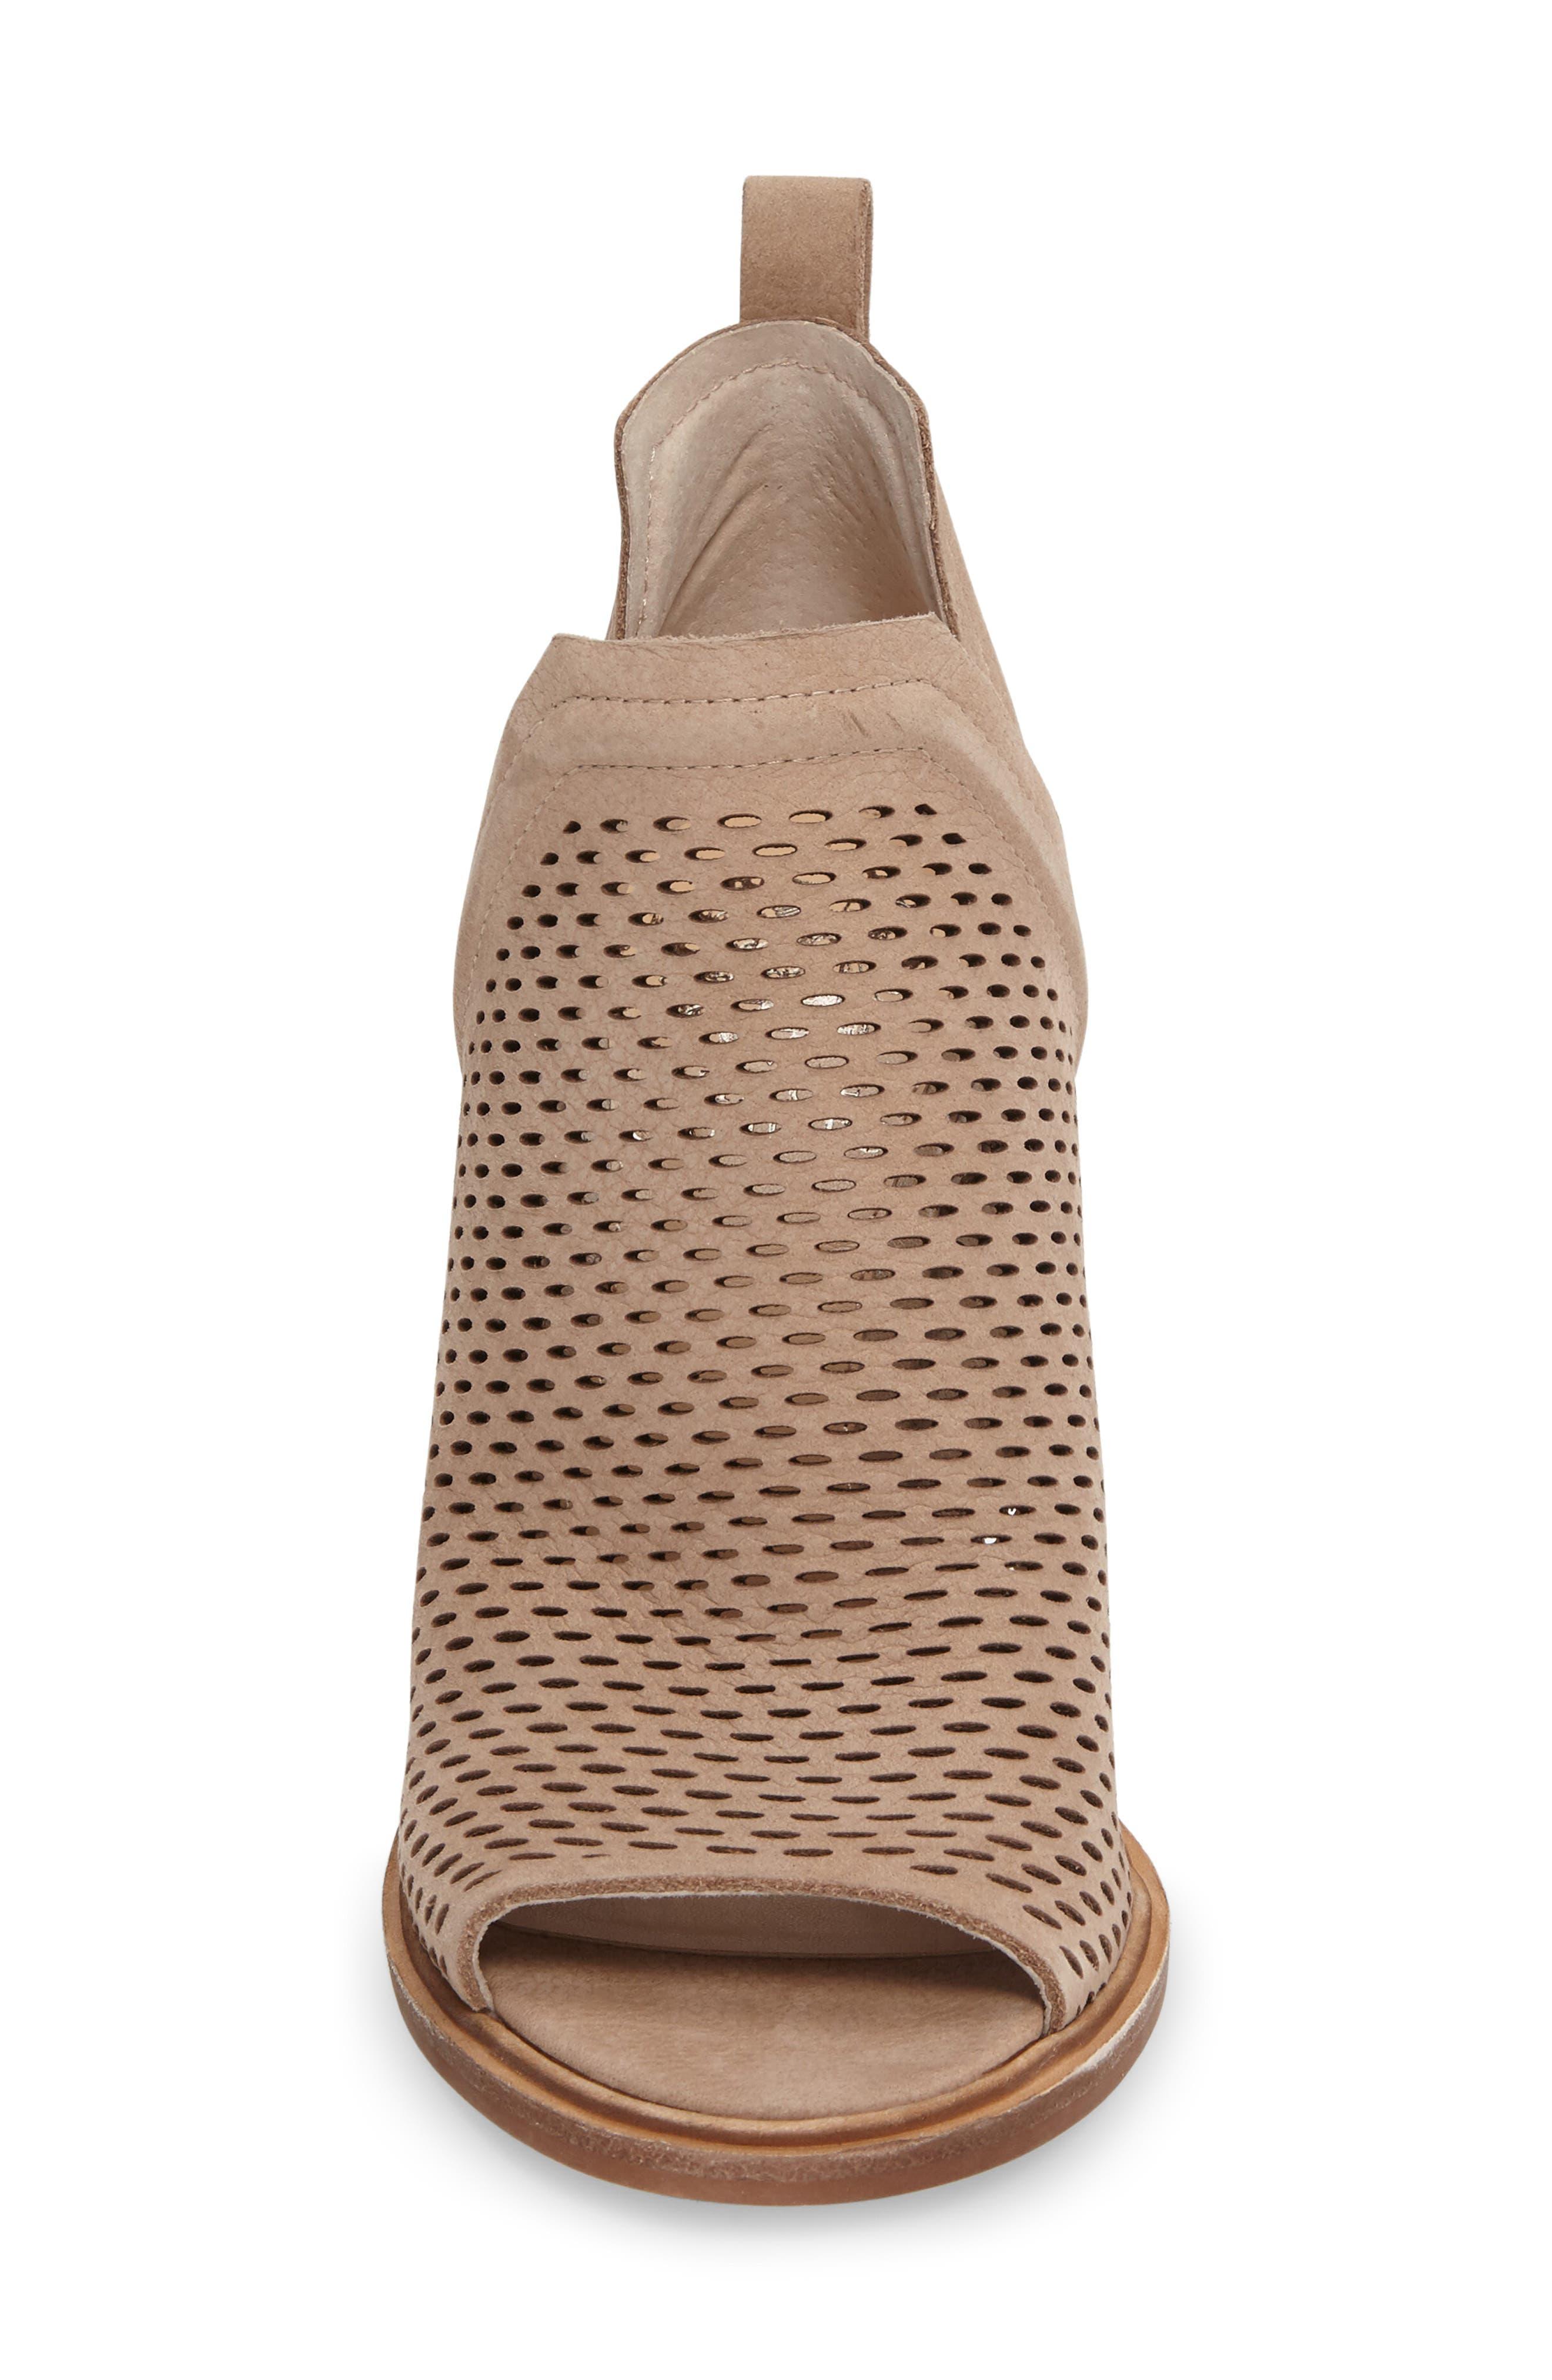 Alternate Image 3  - Vince Camuto Kensa Peep Toe Bootie (Women) (Nordstrom Exclusive)